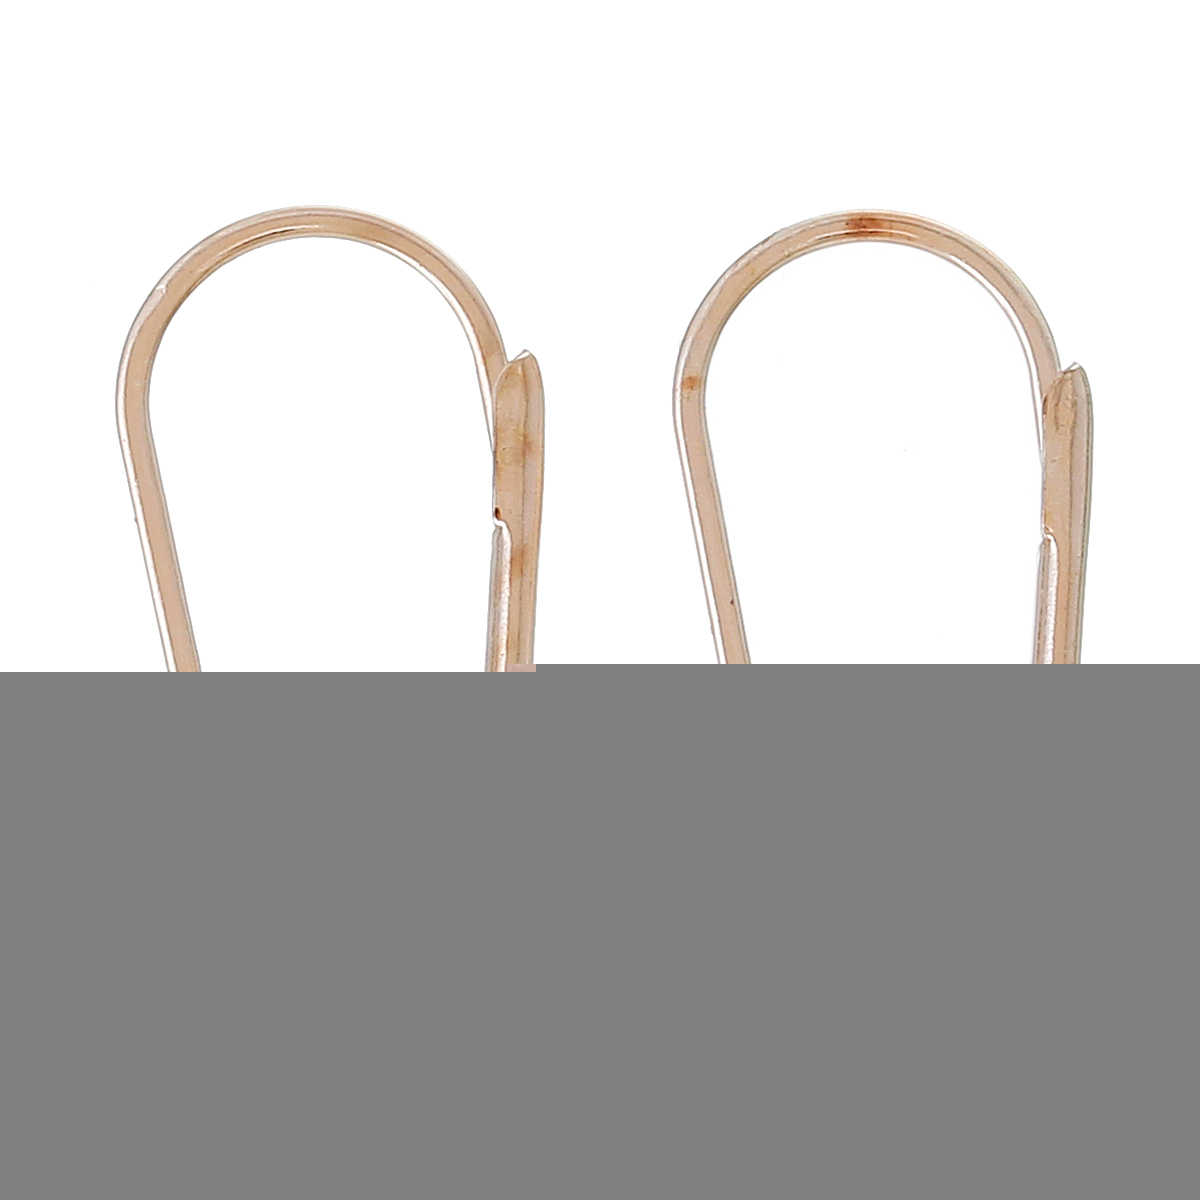 "DoreenBeads אבץ מתכת סגסוגת עגיל רכיבים קליפים עגיל ממצאי עלה זהב 18 מ""מ (6/8 "") x 11 מ""מ (3/8 ""), 4 יחידות"